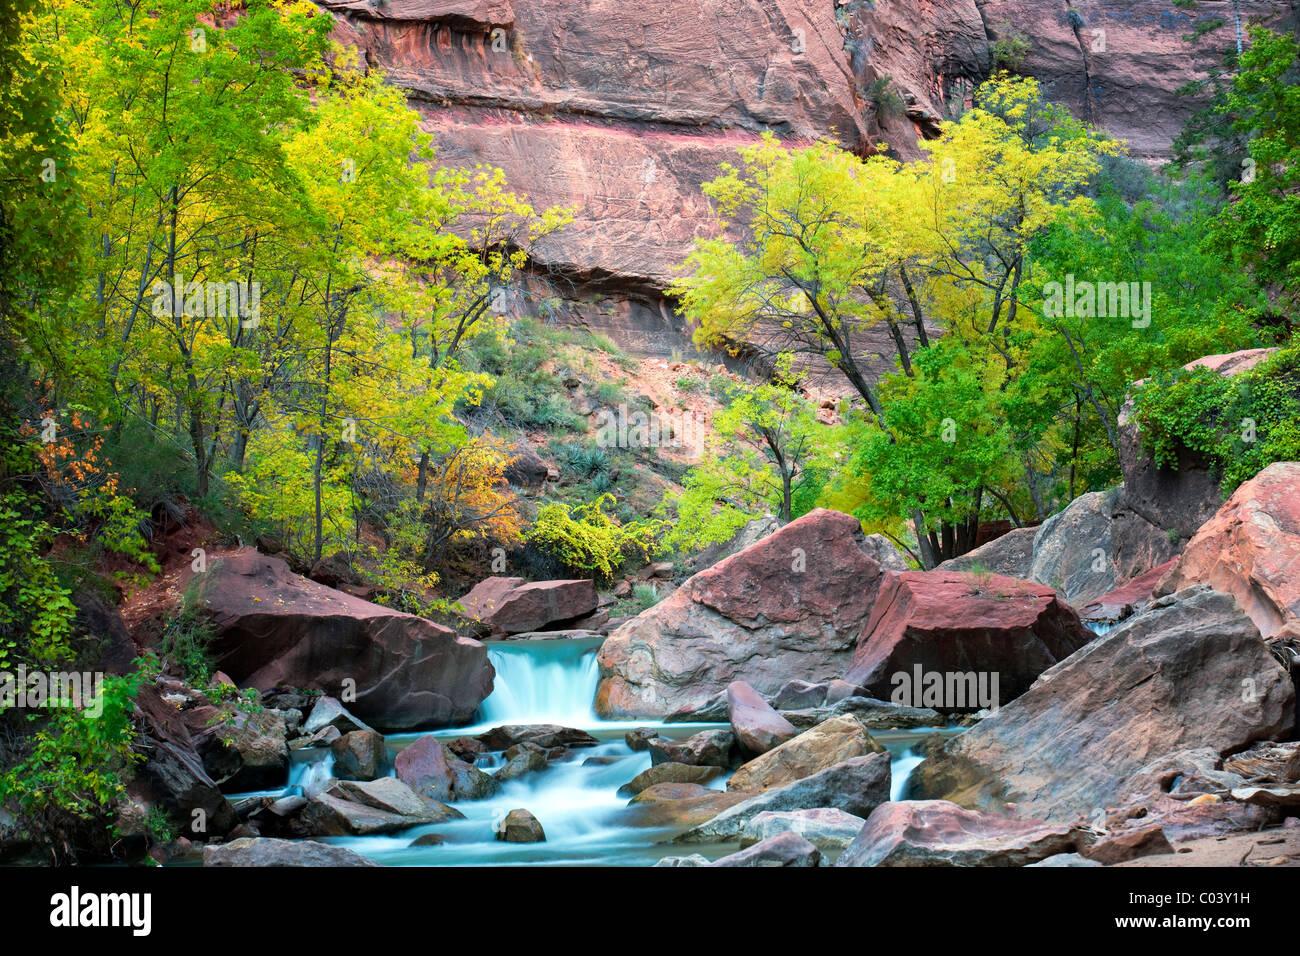 Fall colors and small falls along Virgin River. Zion National Park, Utah. - Stock Image